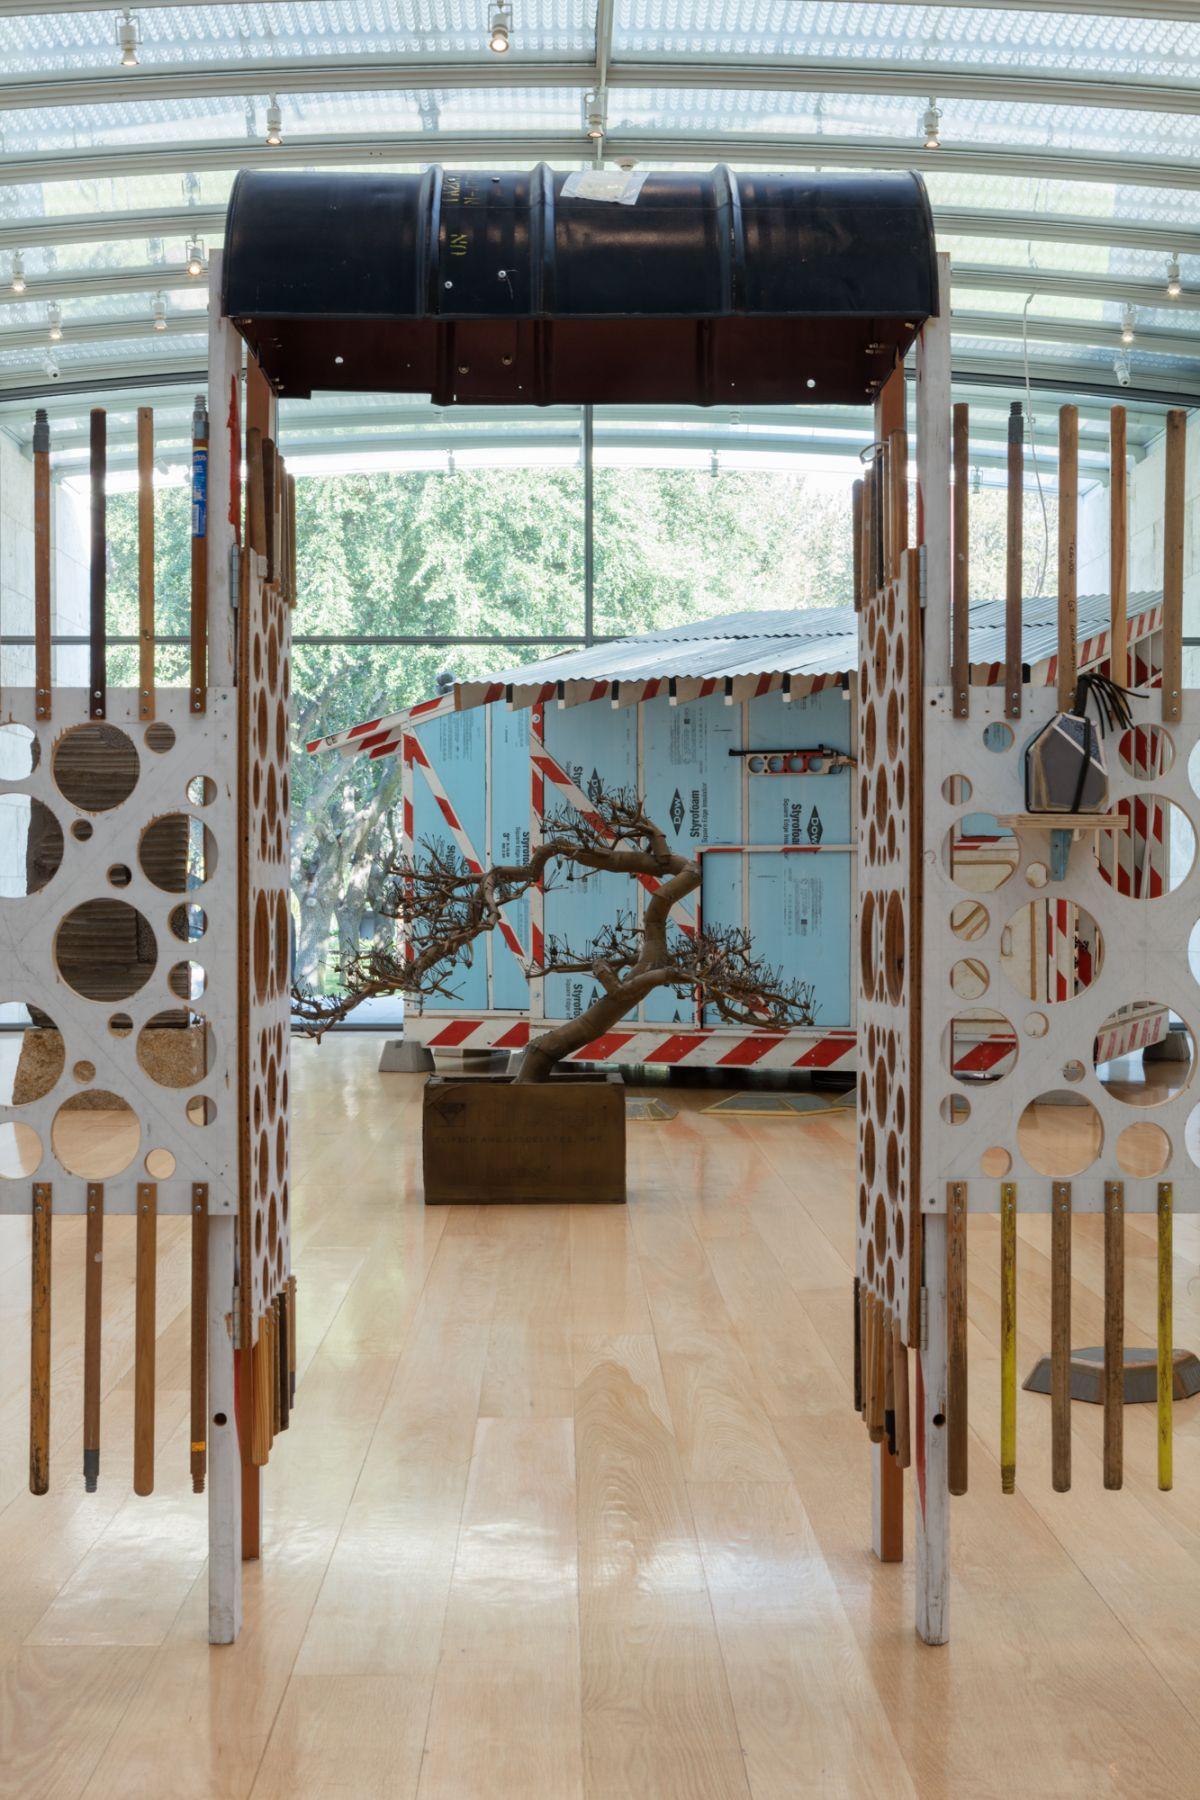 Installation view, Tom Sachs, Tea Ceremony, The Nasher Sculpture Center, Dallas, TX, 2018